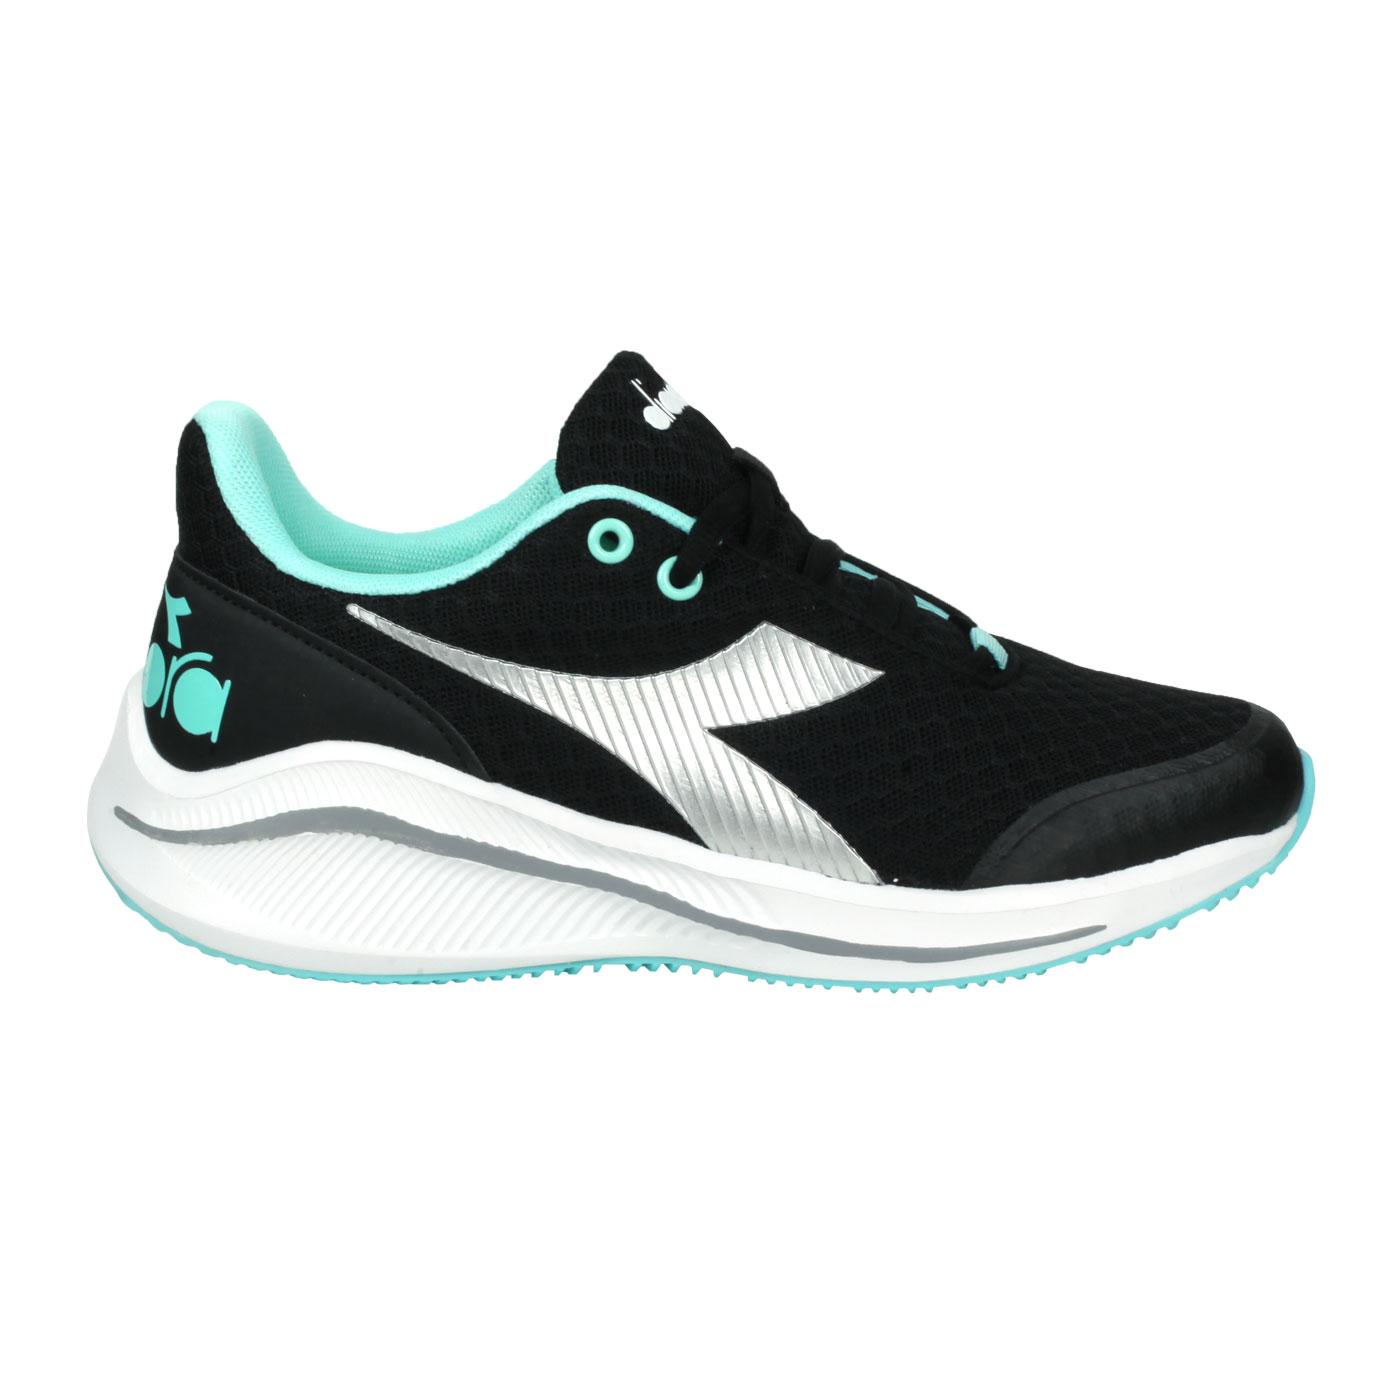 DIADORA 大童專業輕量慢跑鞋-超寬楦 DA11035 - 黑銀湖水綠